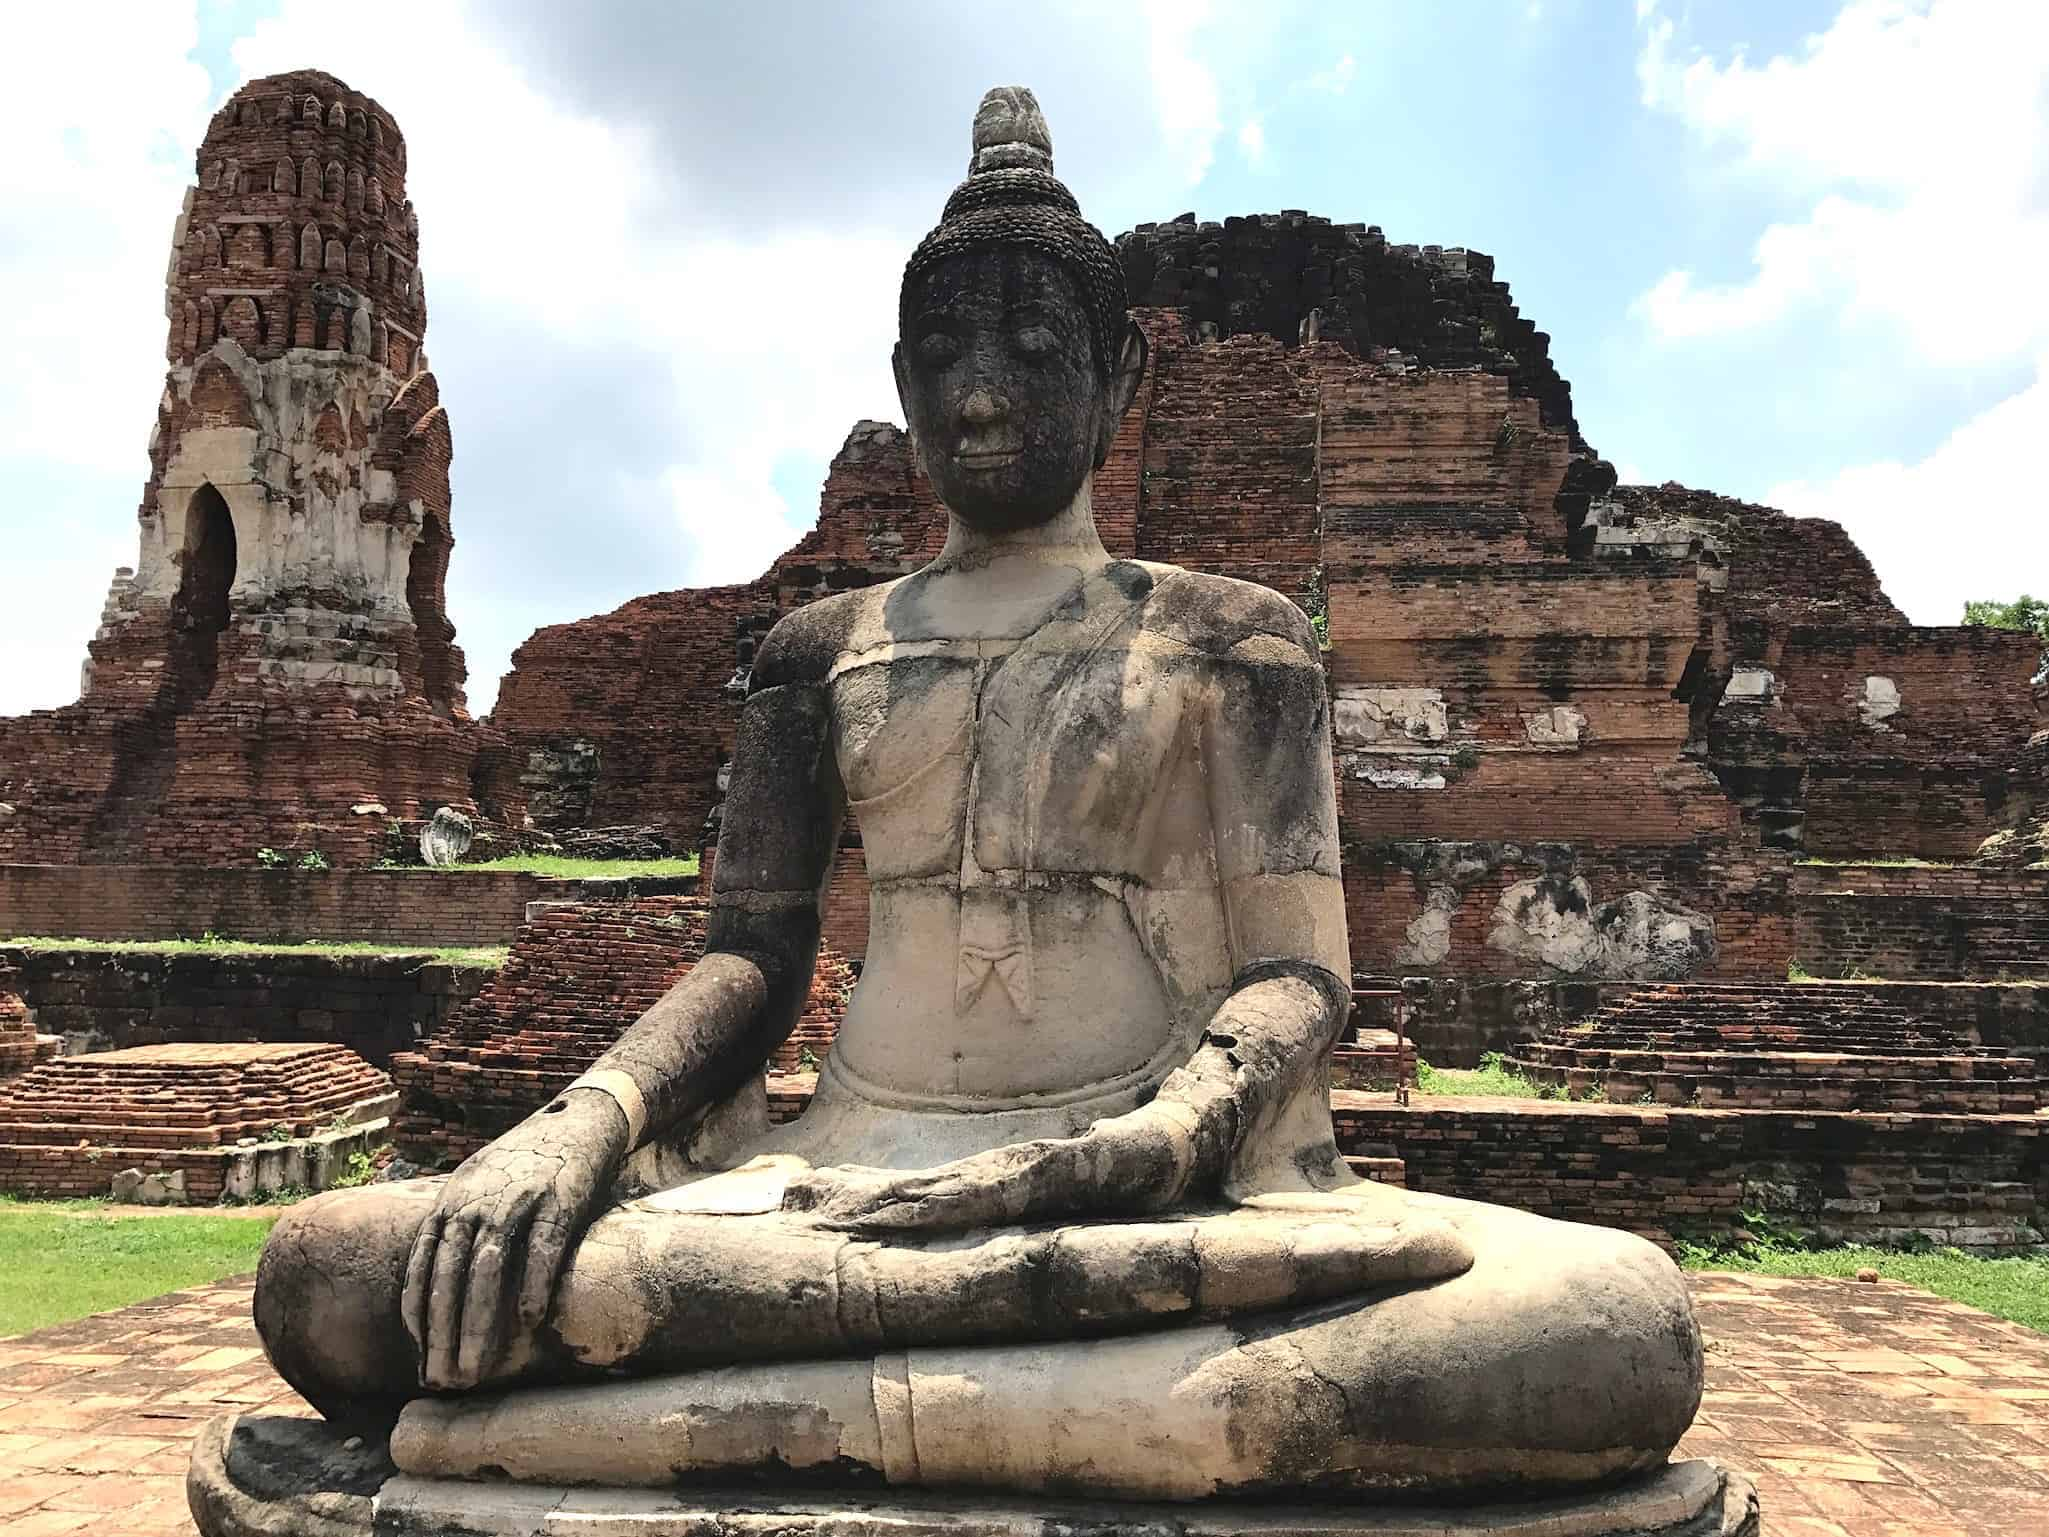 Wat Phra Mahatat Buddha